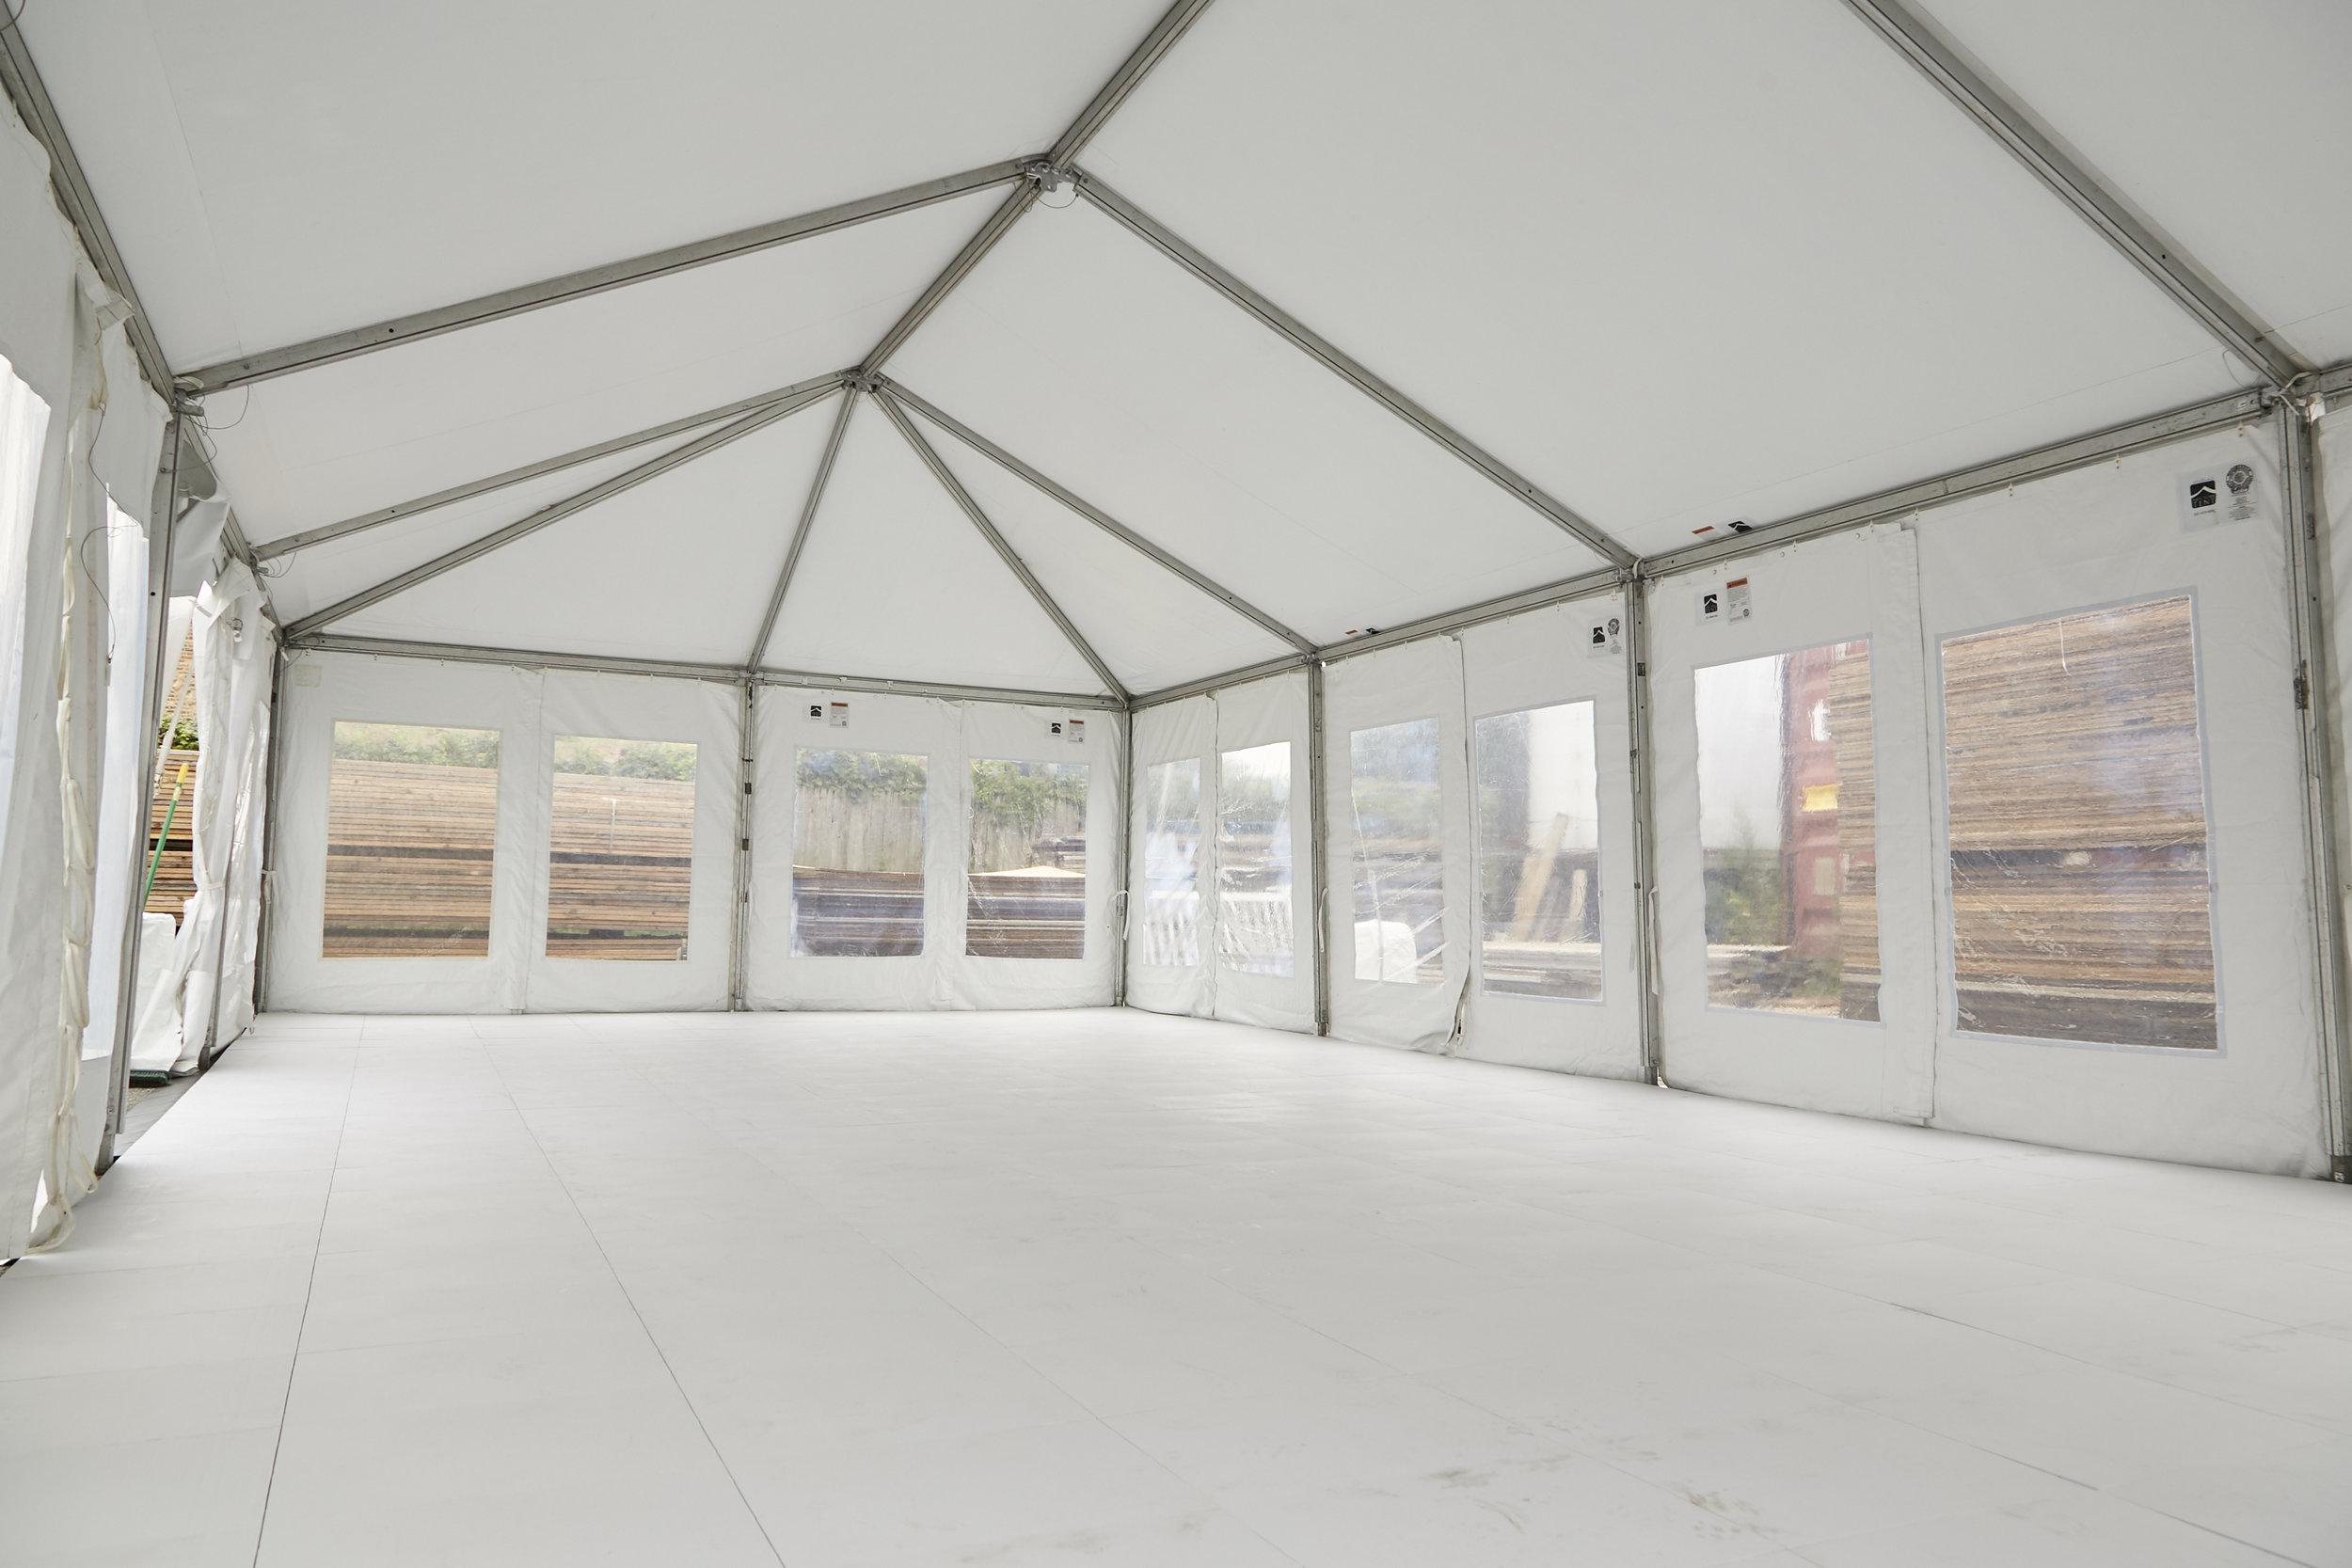 Tent Floors